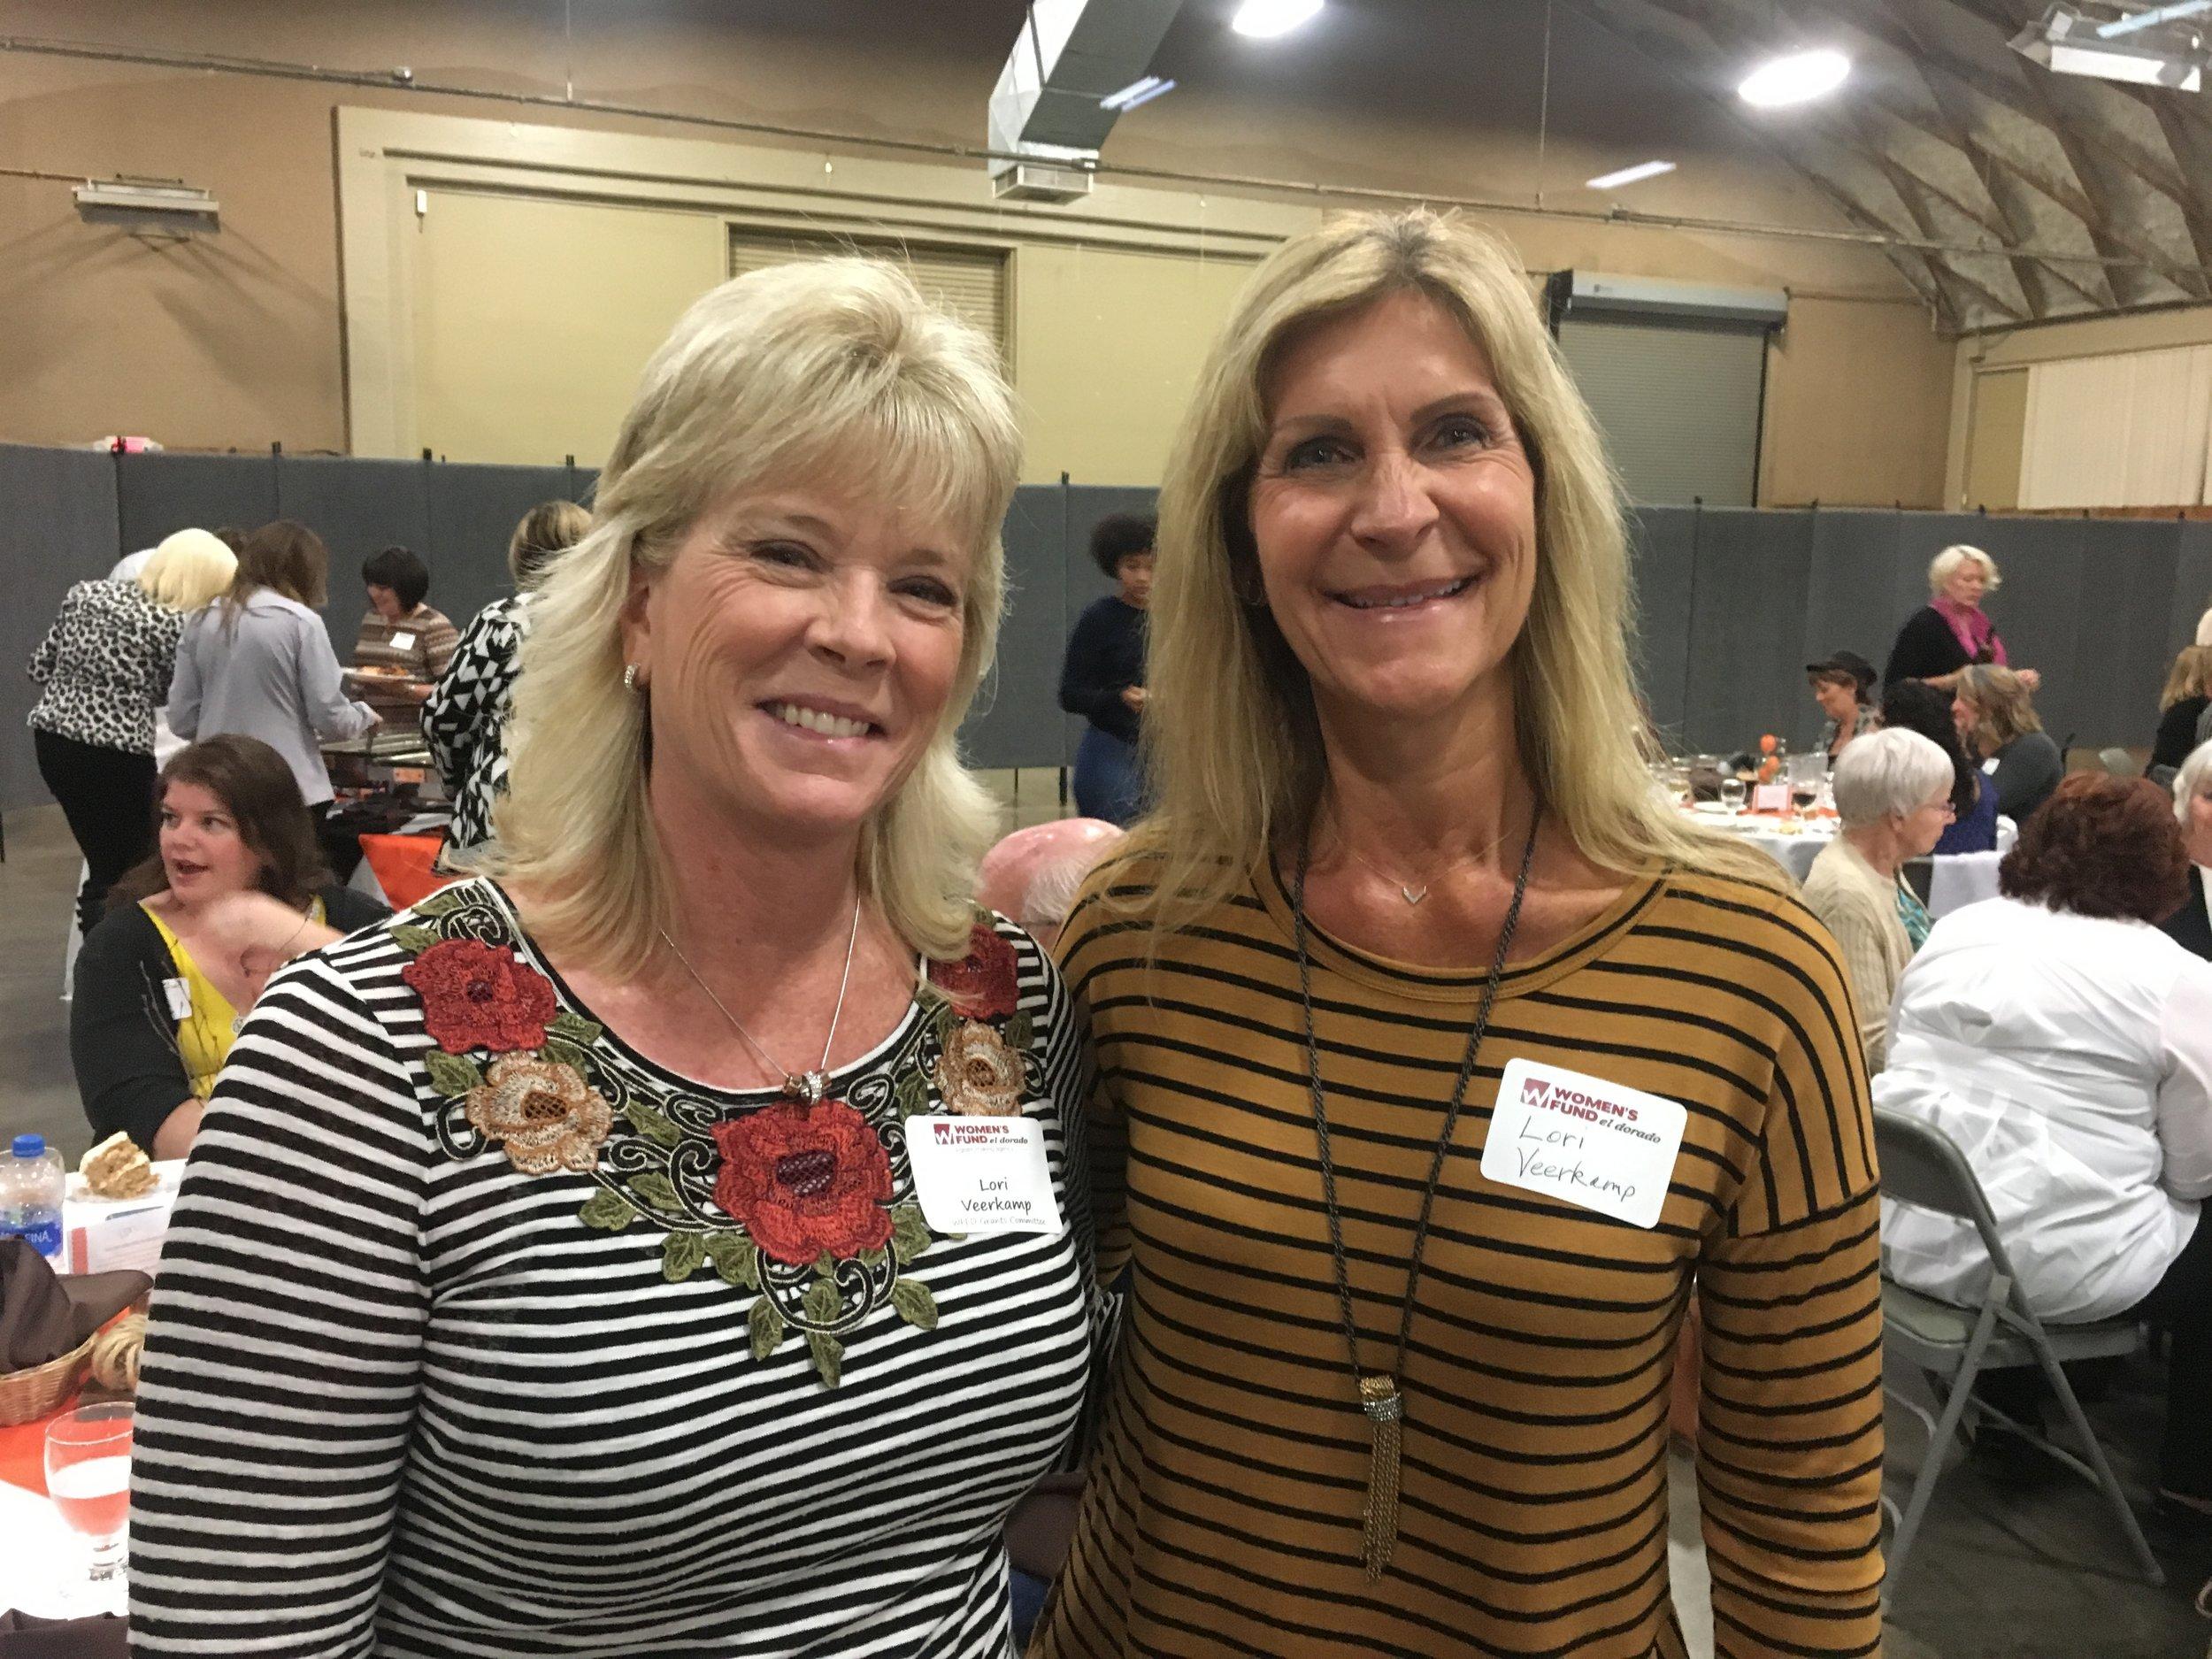 IMG_5 Lori Veerkamp and Lori Veerkamp.JPG